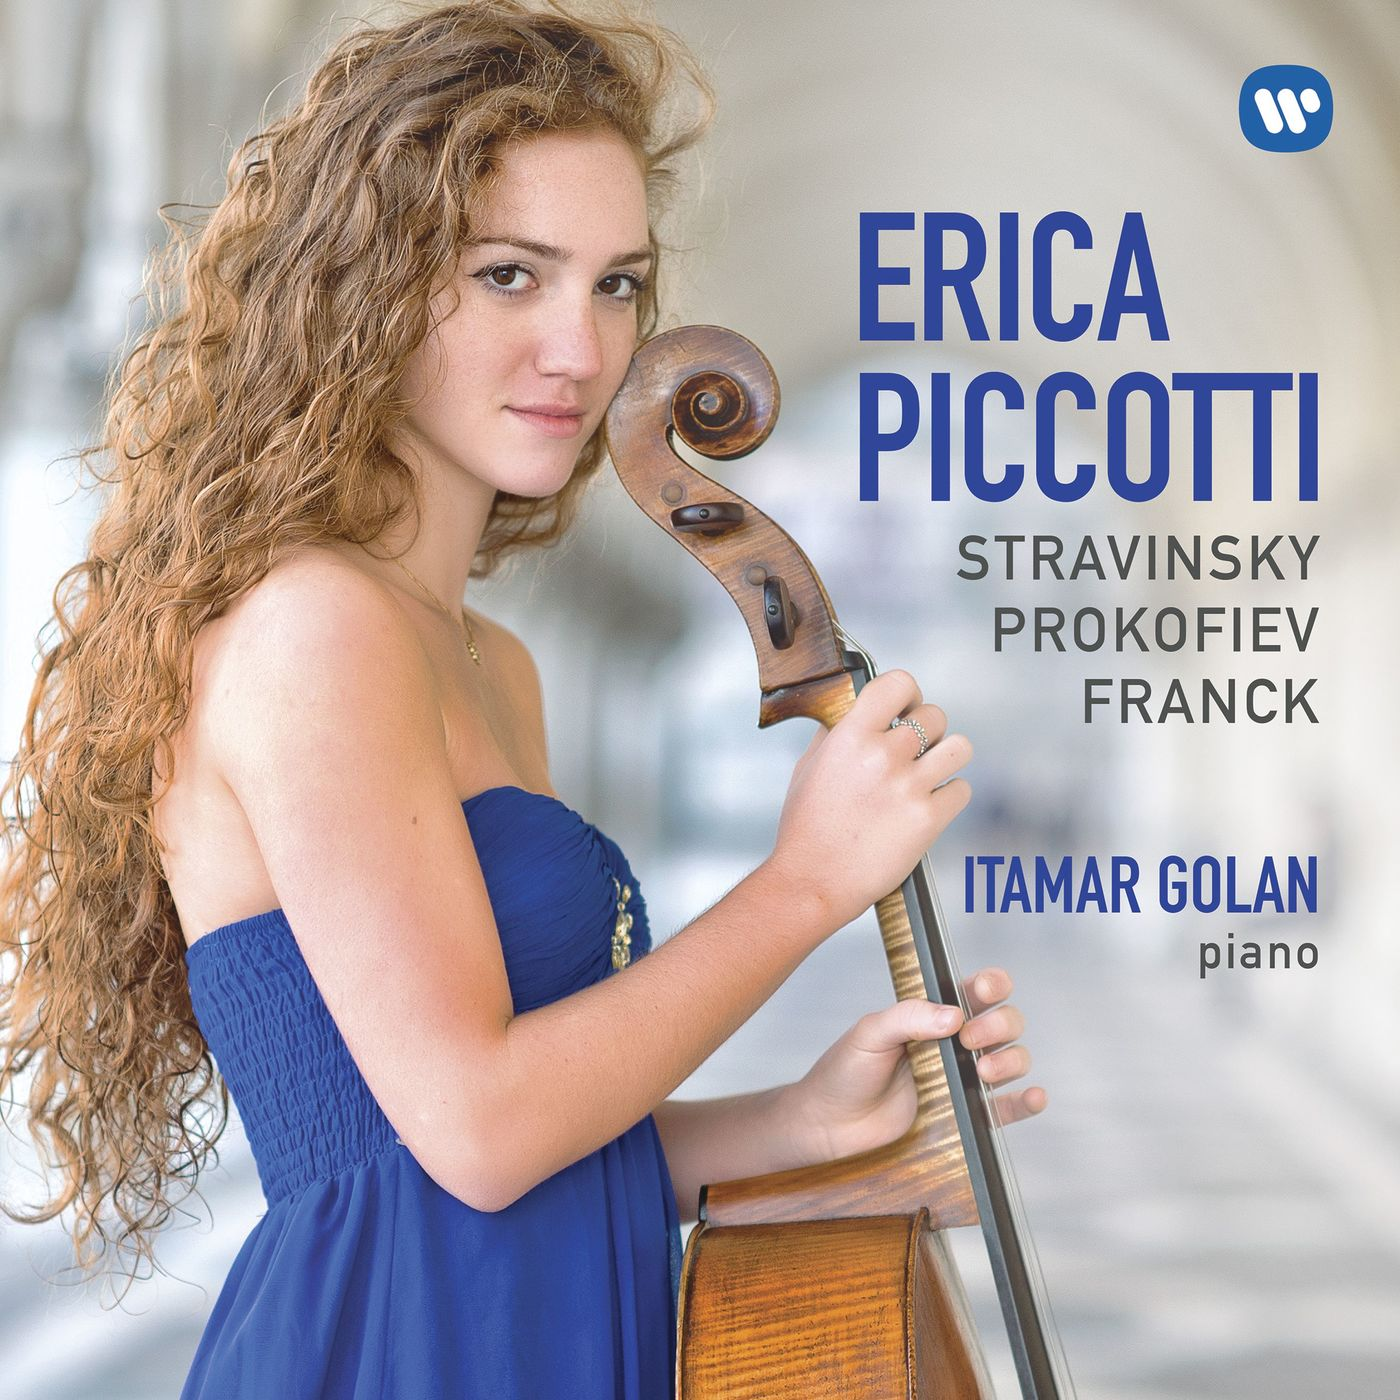 Erica Piccotti - Stravinsky, Prokofiev & Franck Works for Cello & Piano (2018).mp3 - 320 Kbps